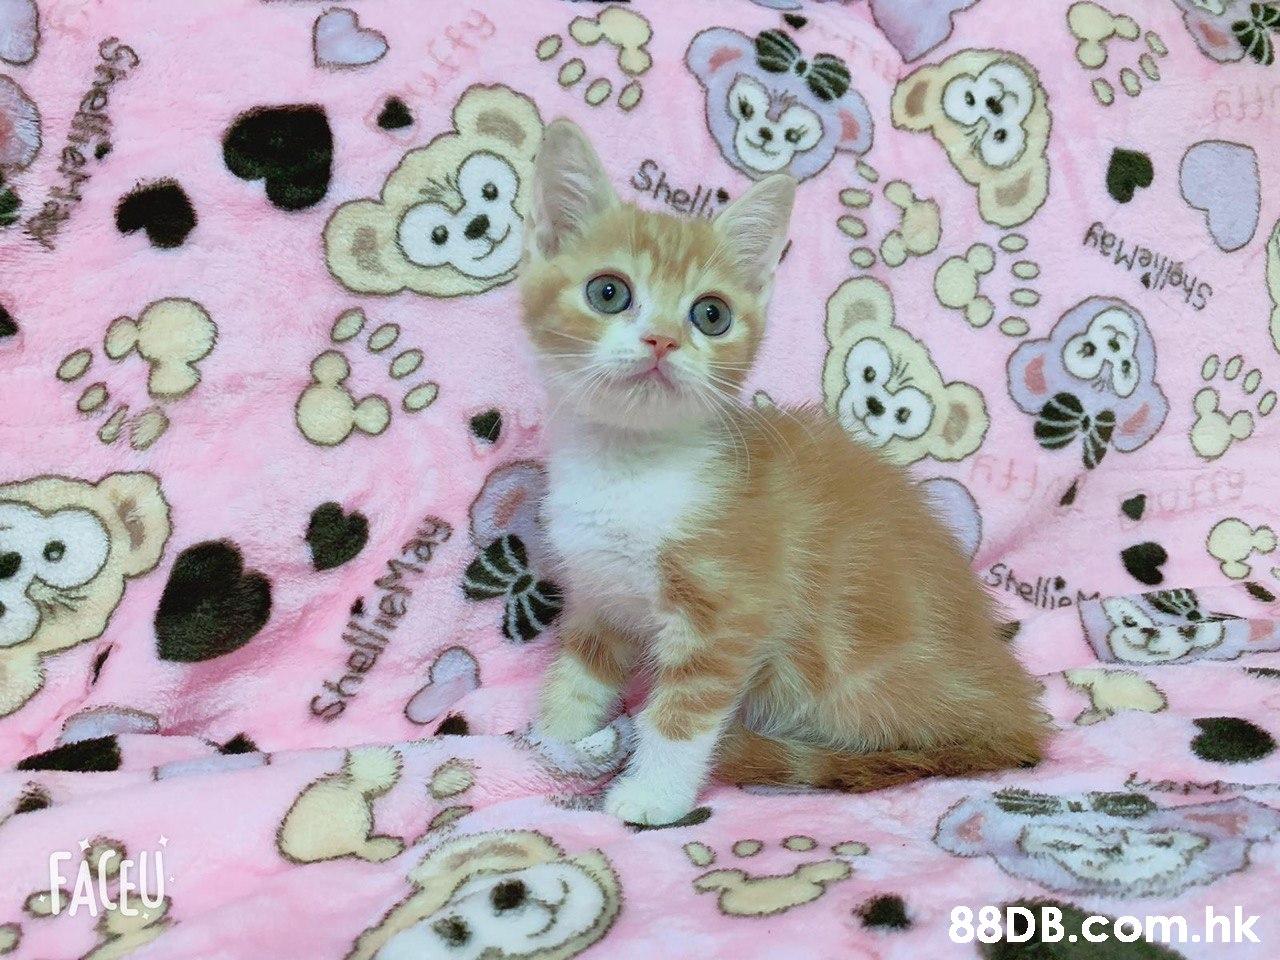 Shell .hk  Cat,Small to medium-sized cats,Felidae,Kitten,Whiskers